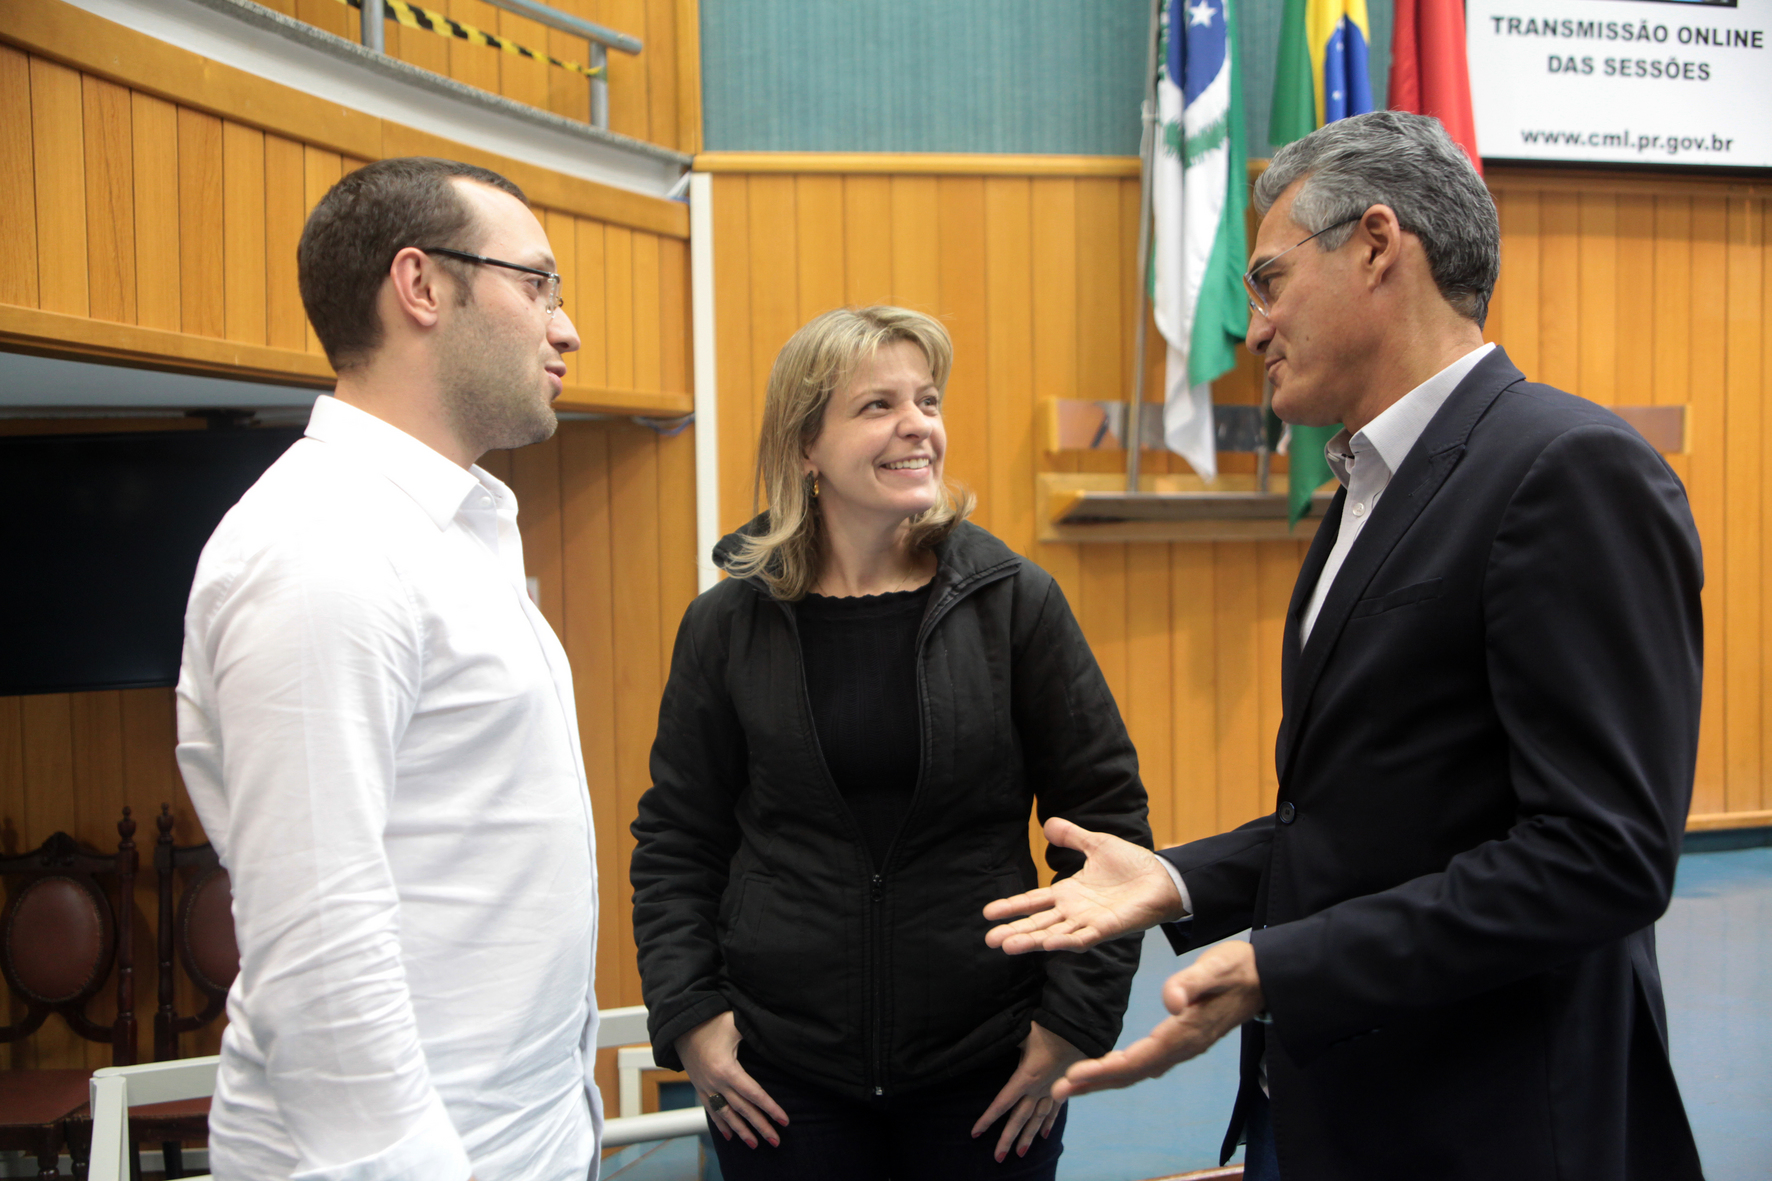 Filipe Barros, Daniele Ziober e Amauri Cardoso. Foto: Devanir Parra/CM